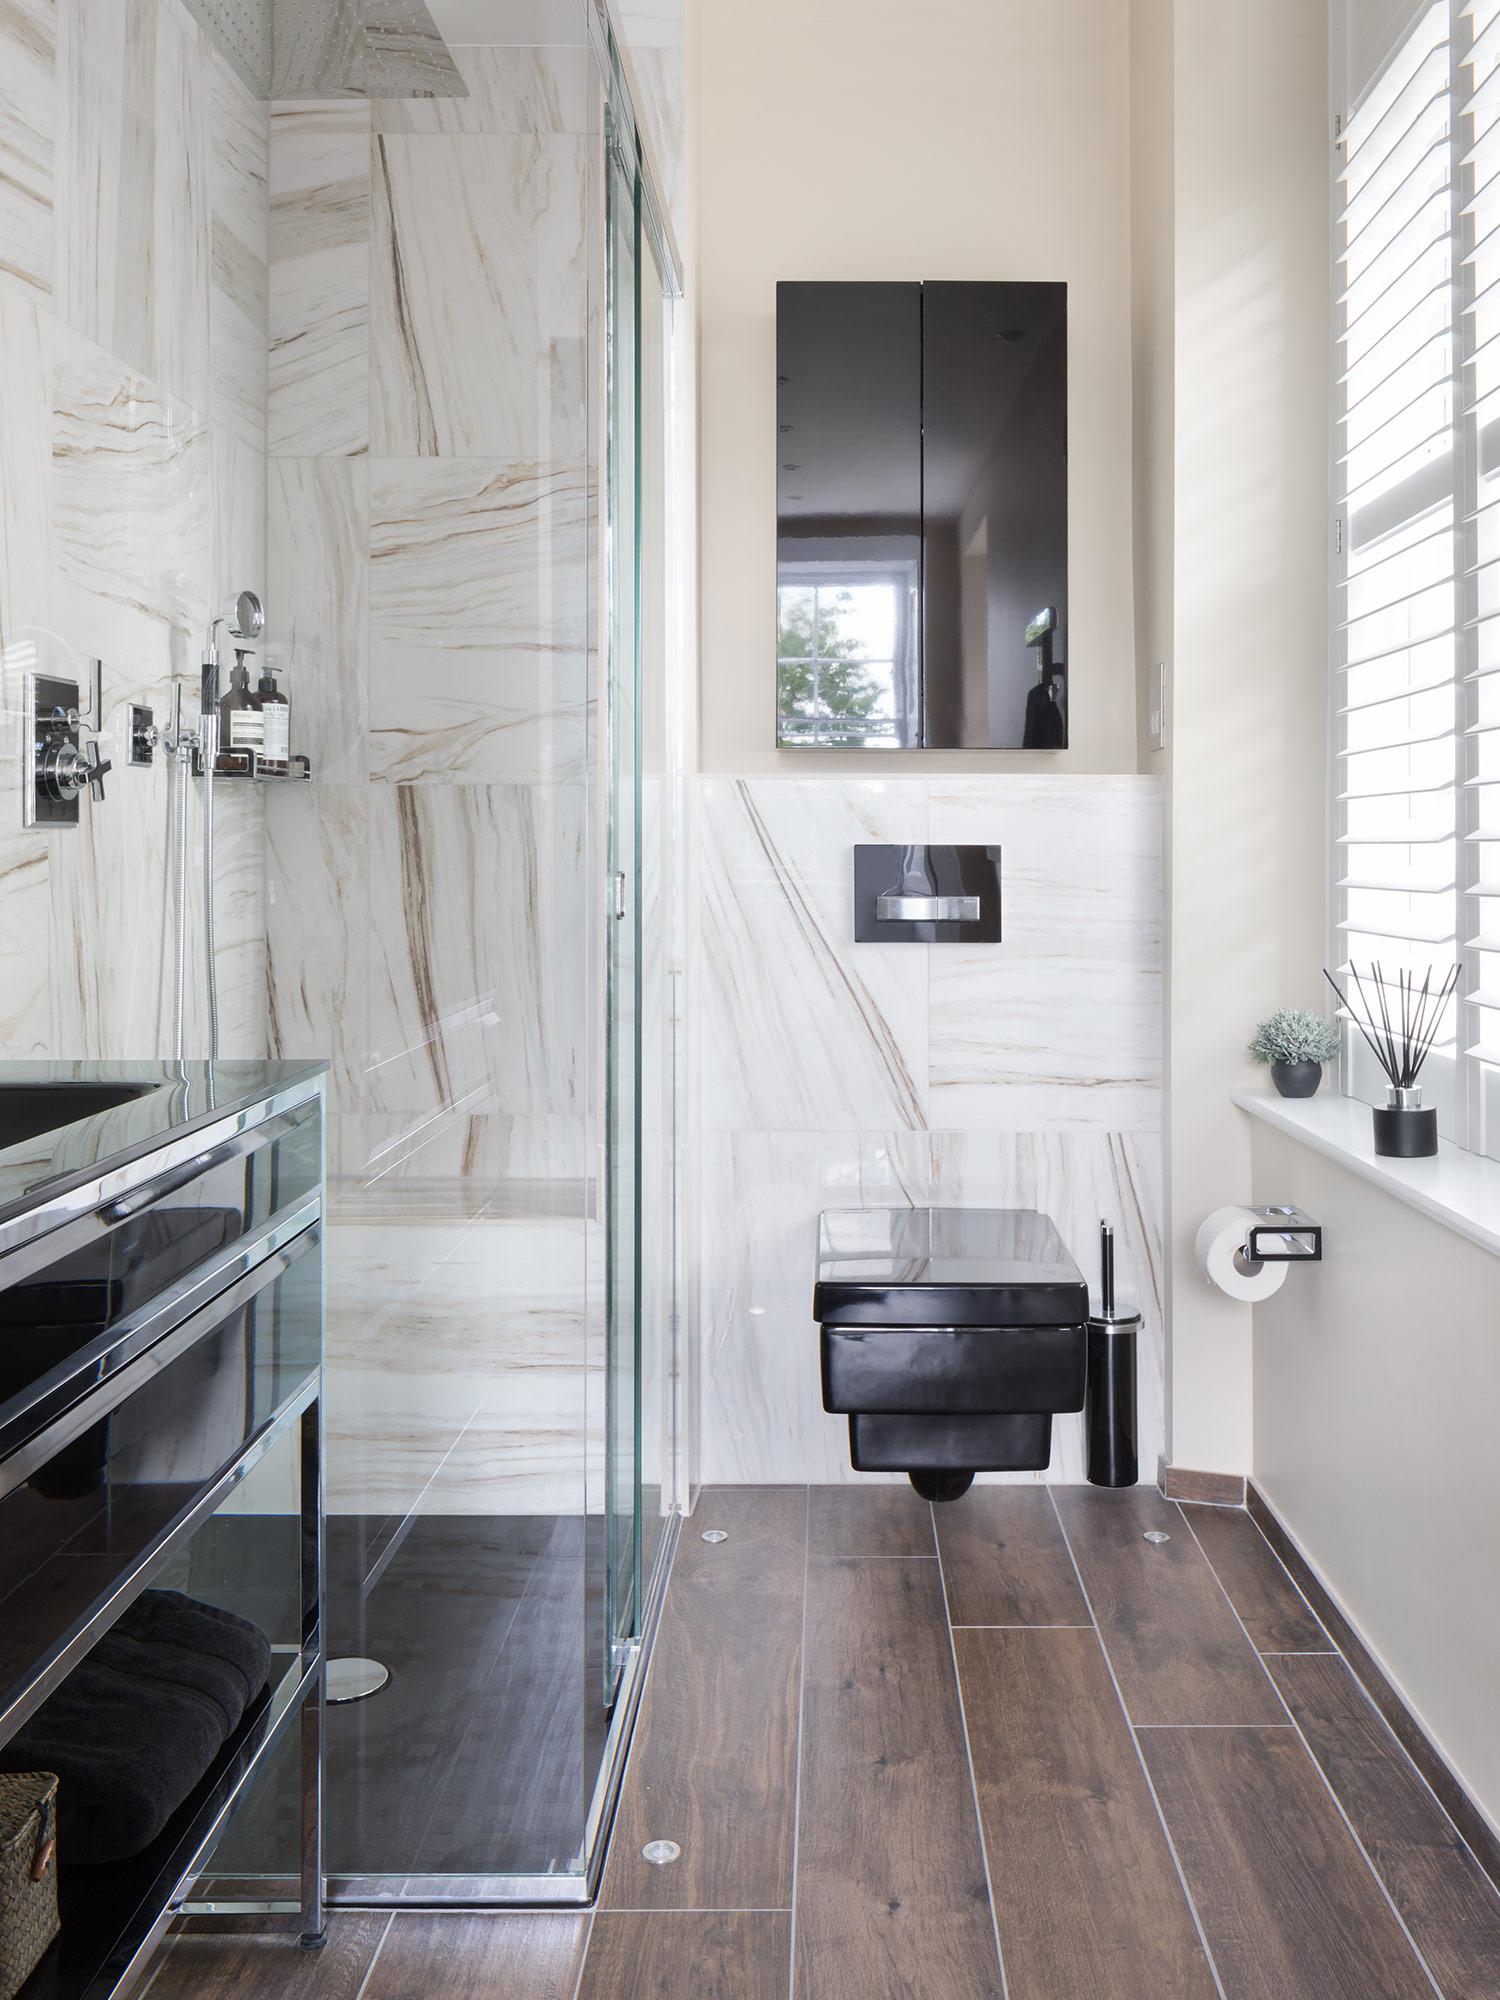 West One Bathrooms Case Studies: Tunbridge Wells (Image 8)